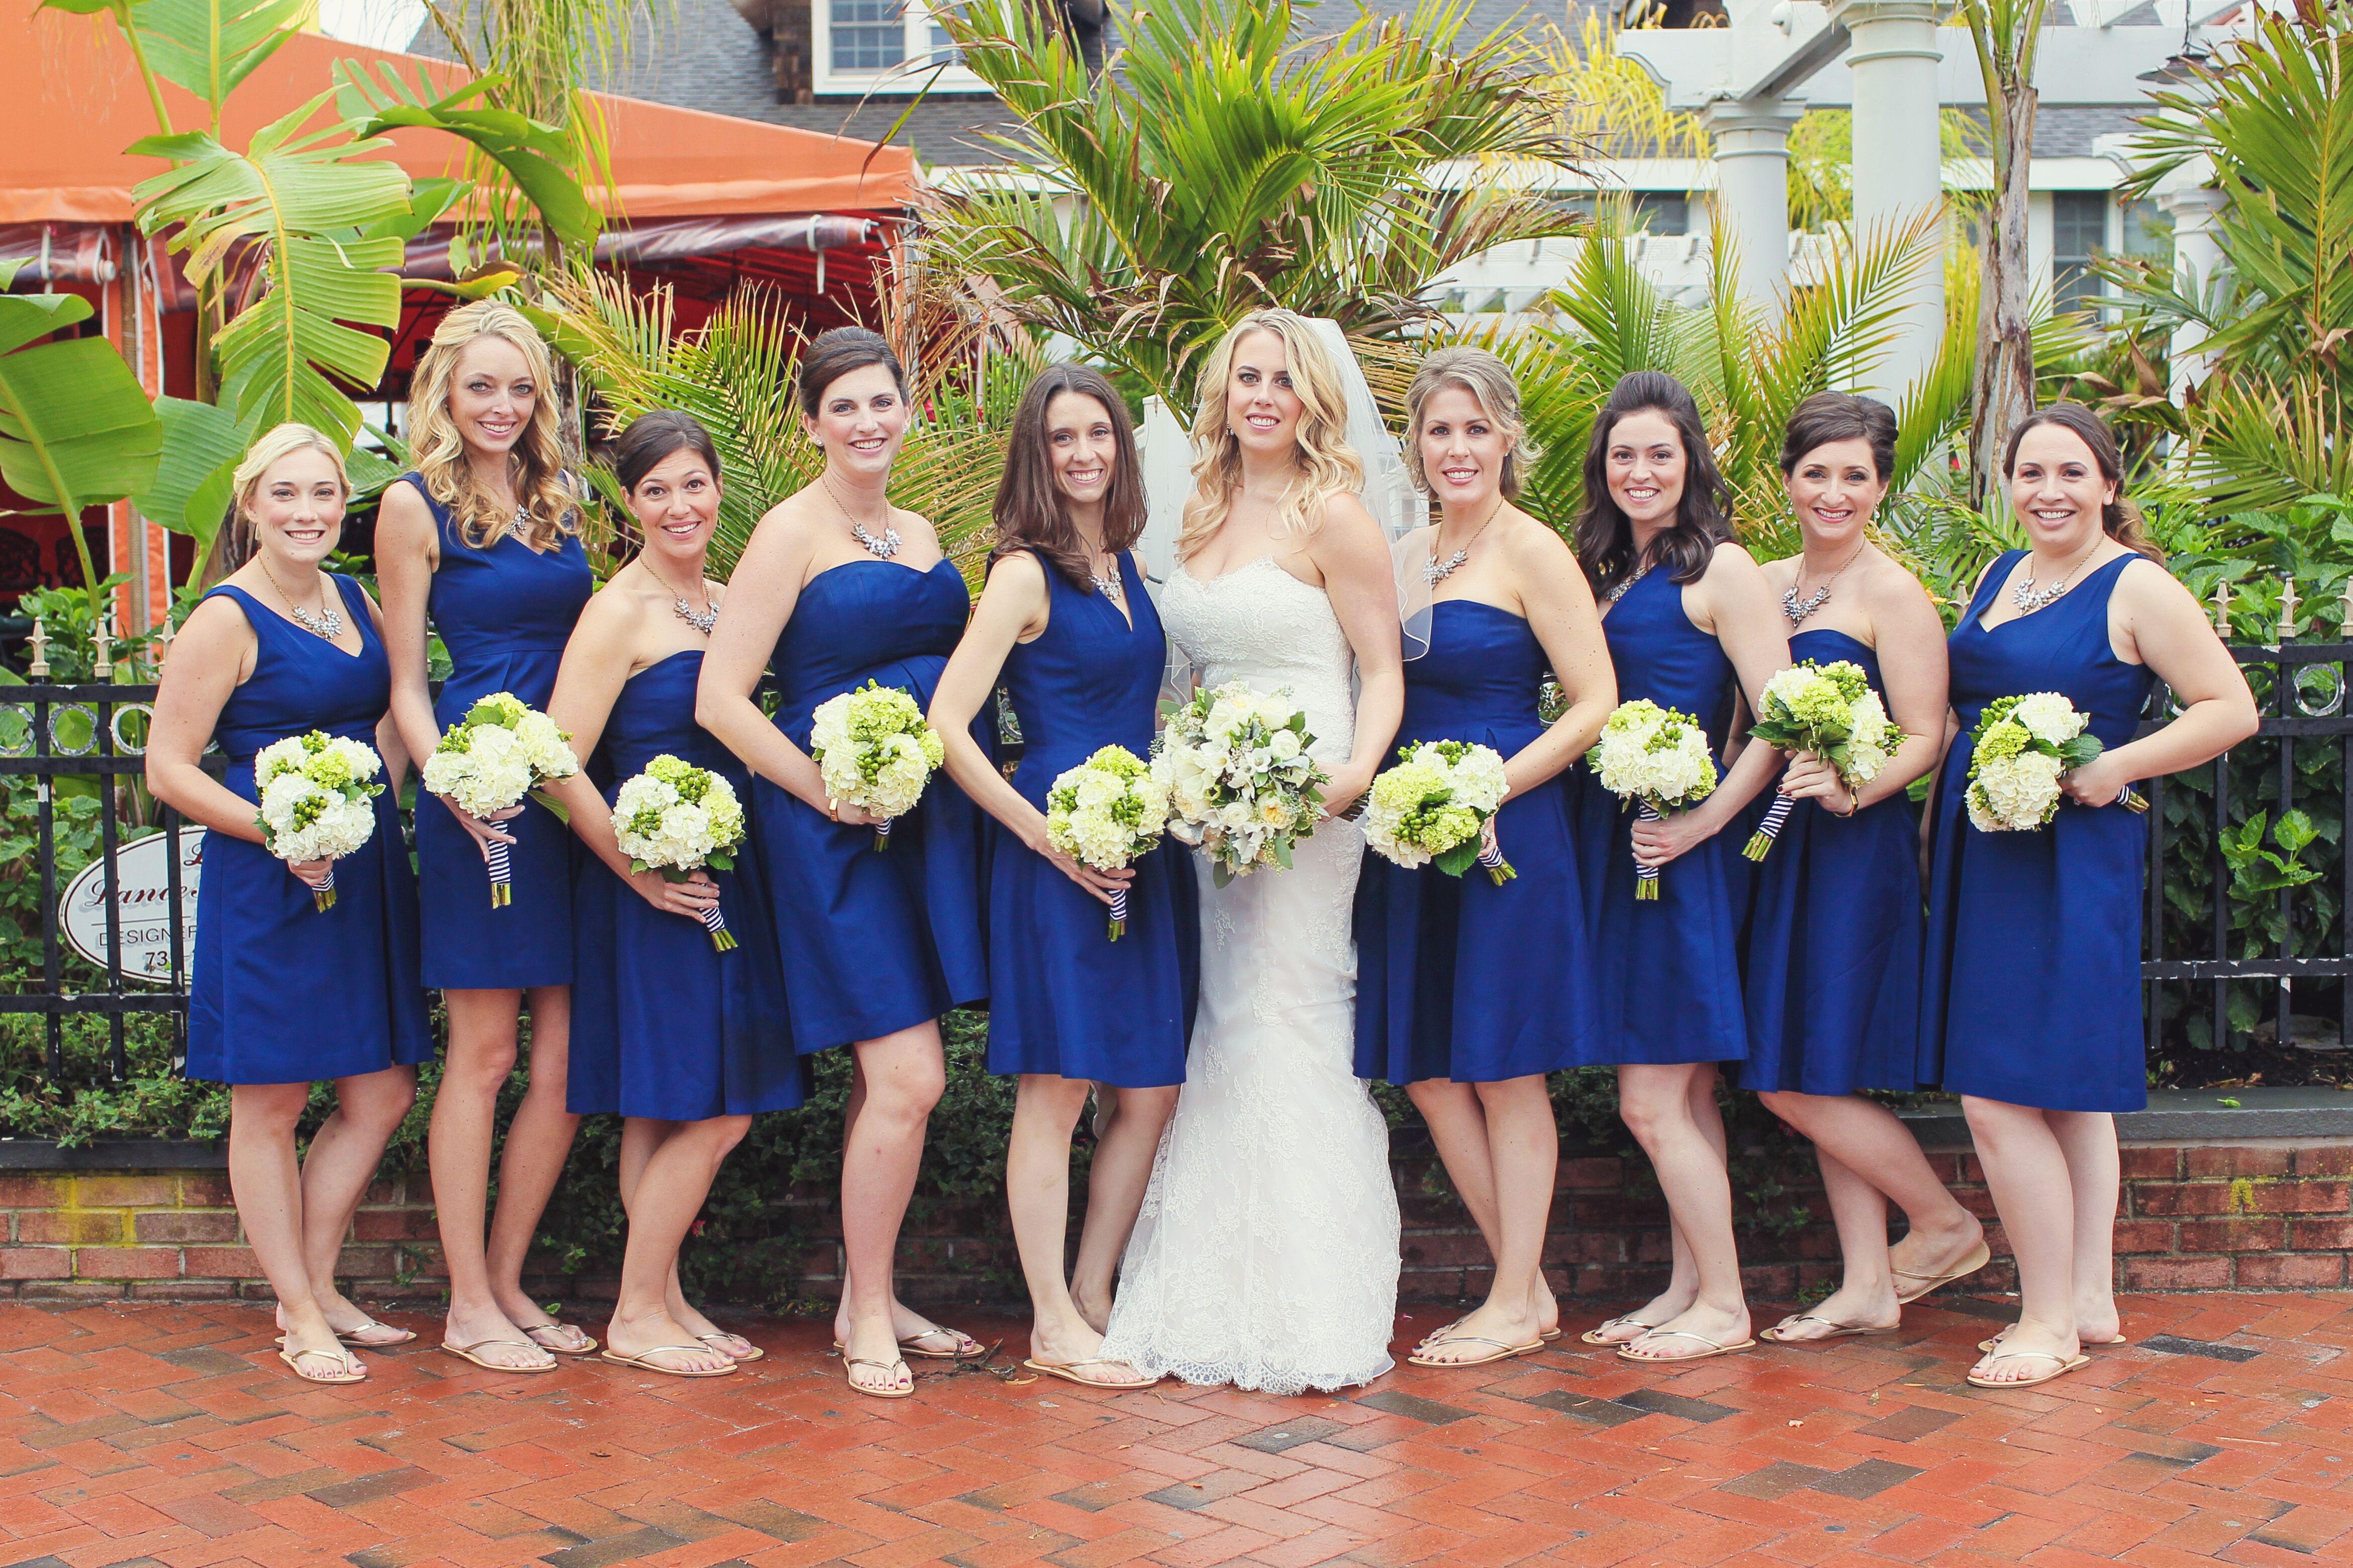 J Crew Blue Bridesmaid Dresses With Flat Sandals